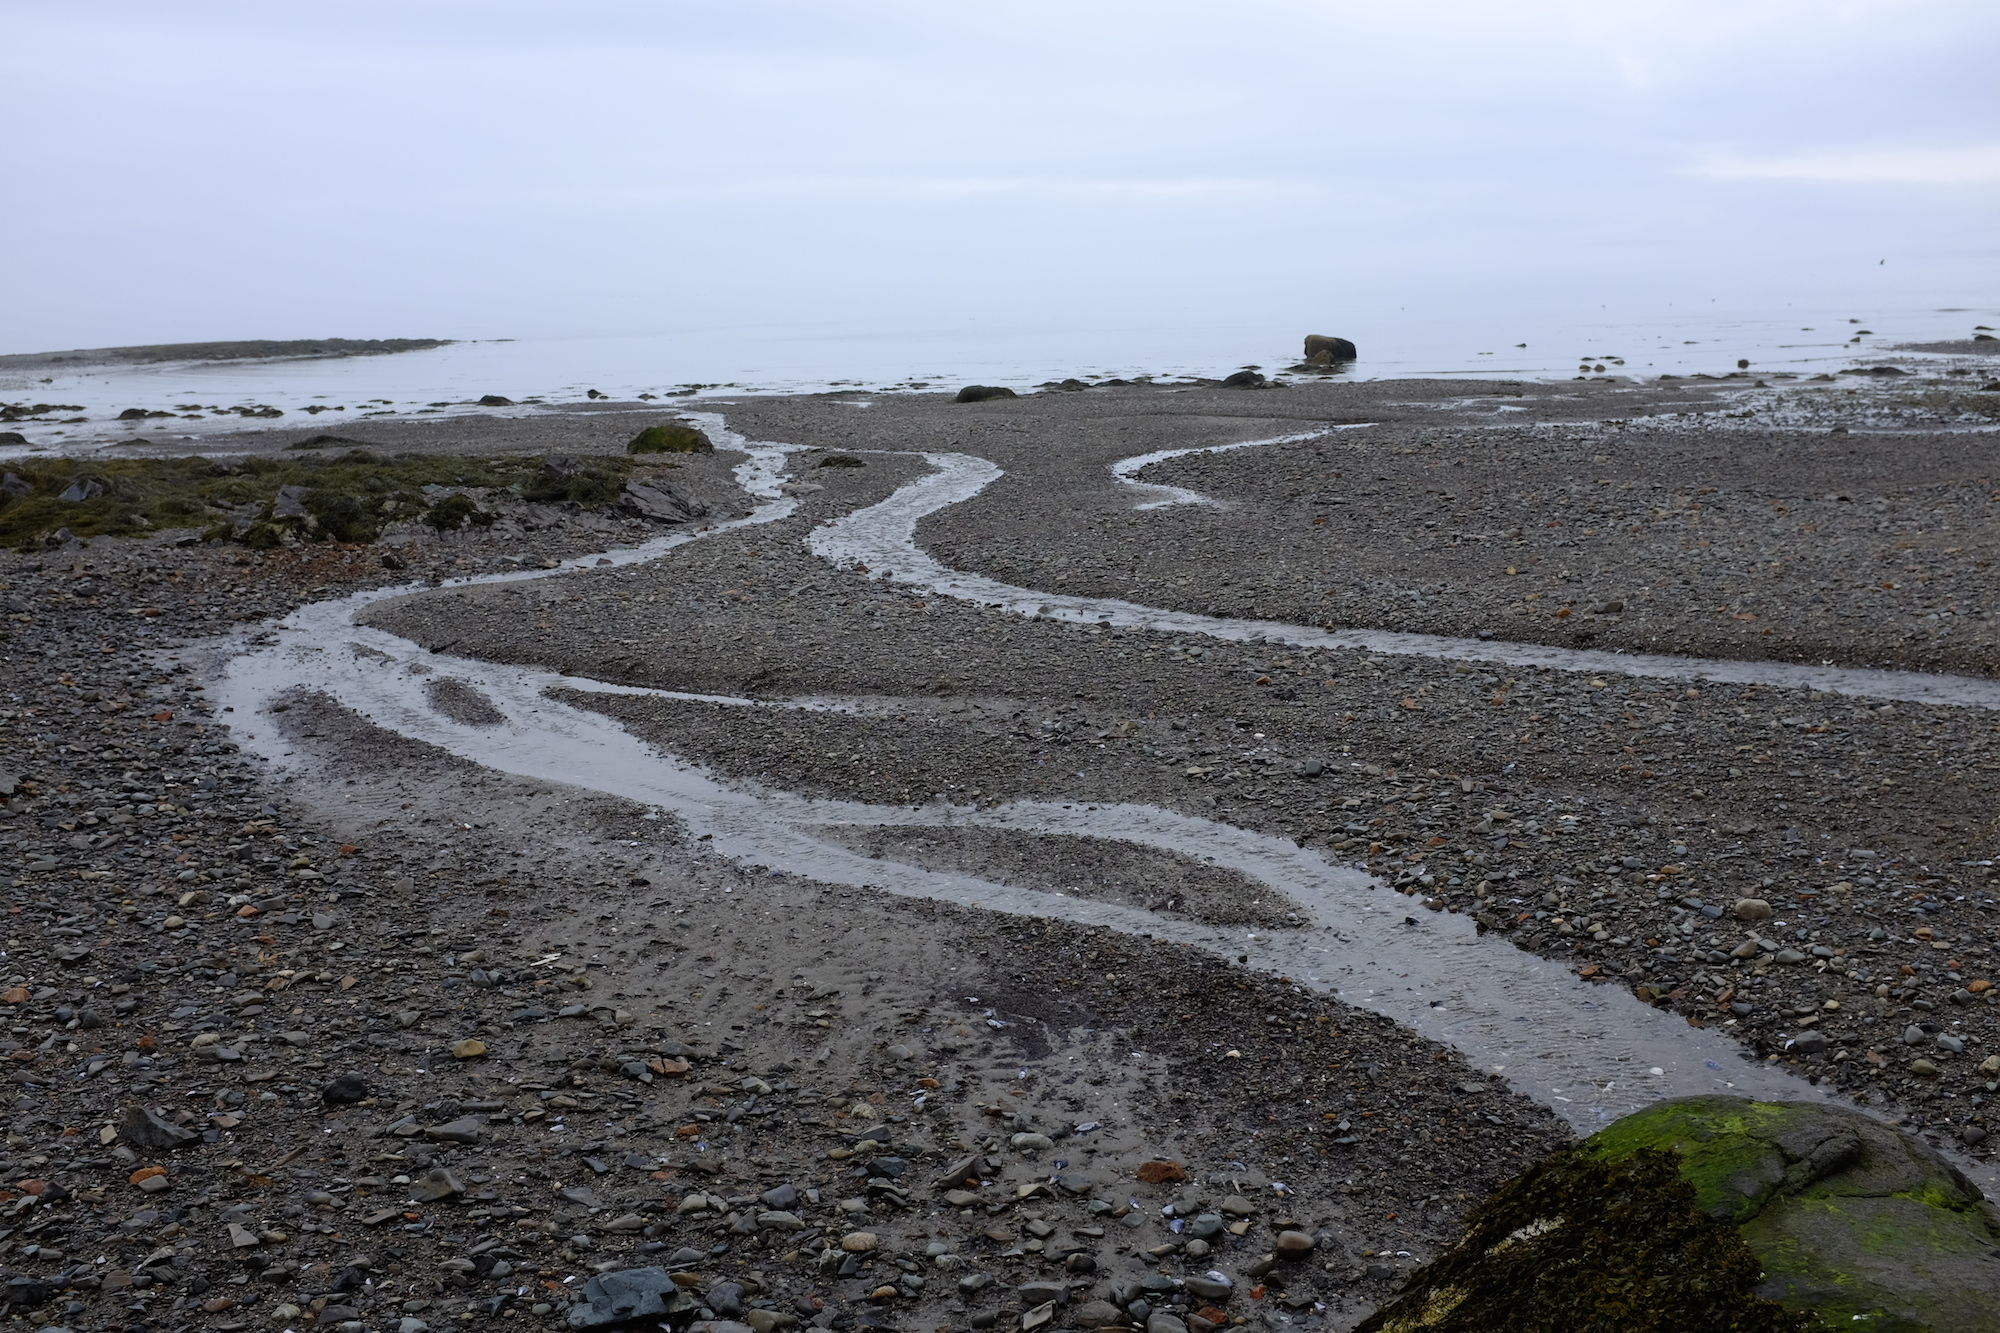 Hulls Cove Beach, Composition 4